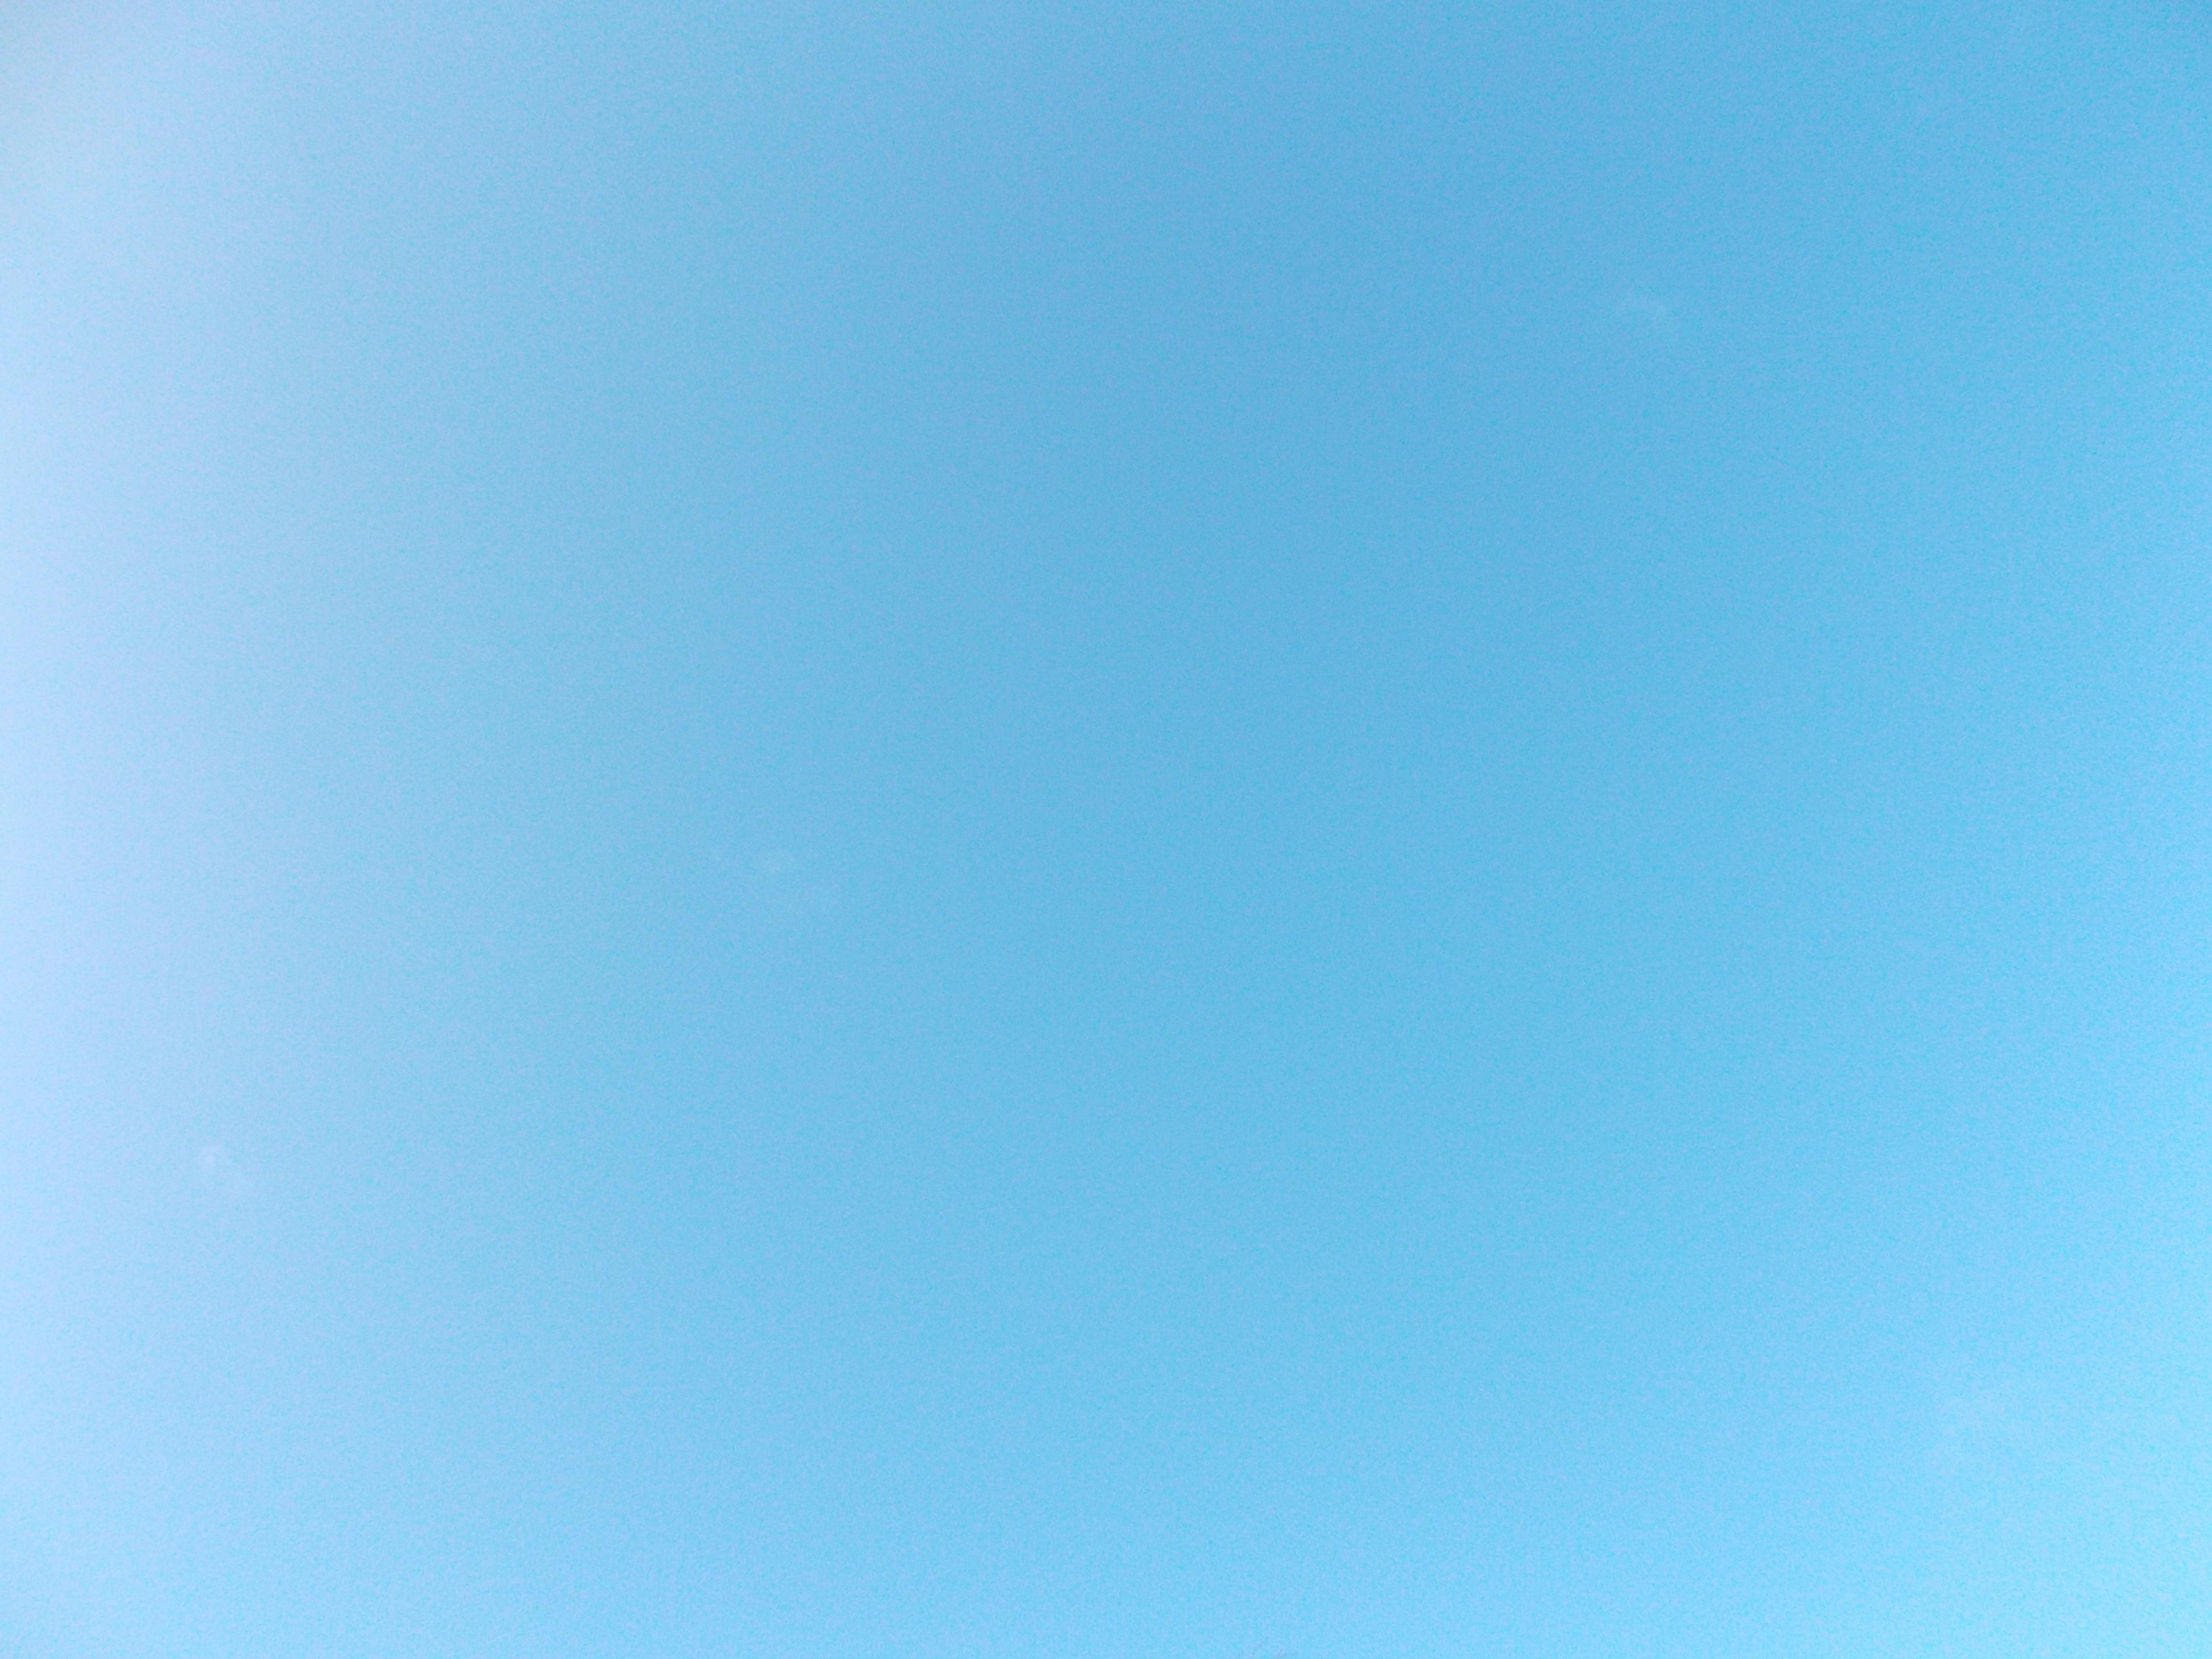 2013-01-27 Longitude -0.371 Latitude 49.182 Altitude 13 Heure 12h39